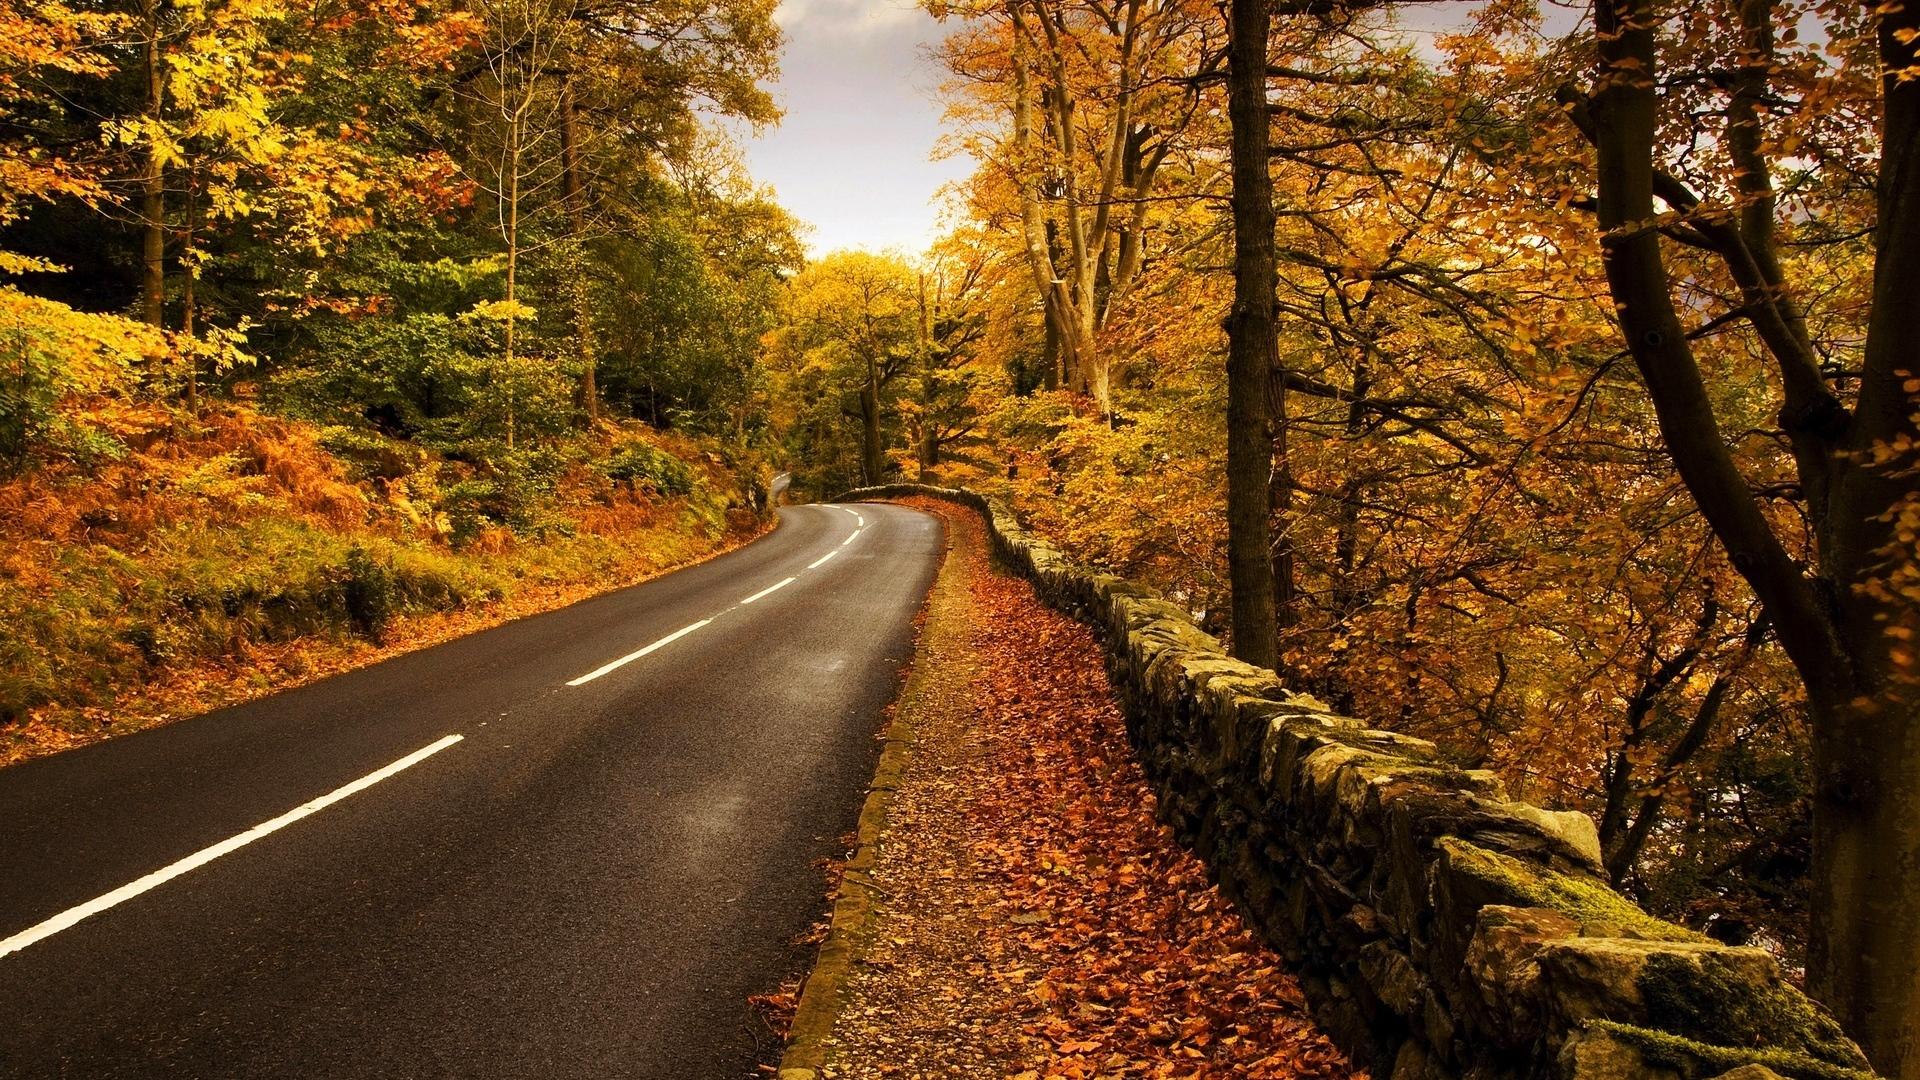 Download Wallpaper 1920x1080 road, roadside, autumn, leaves ...